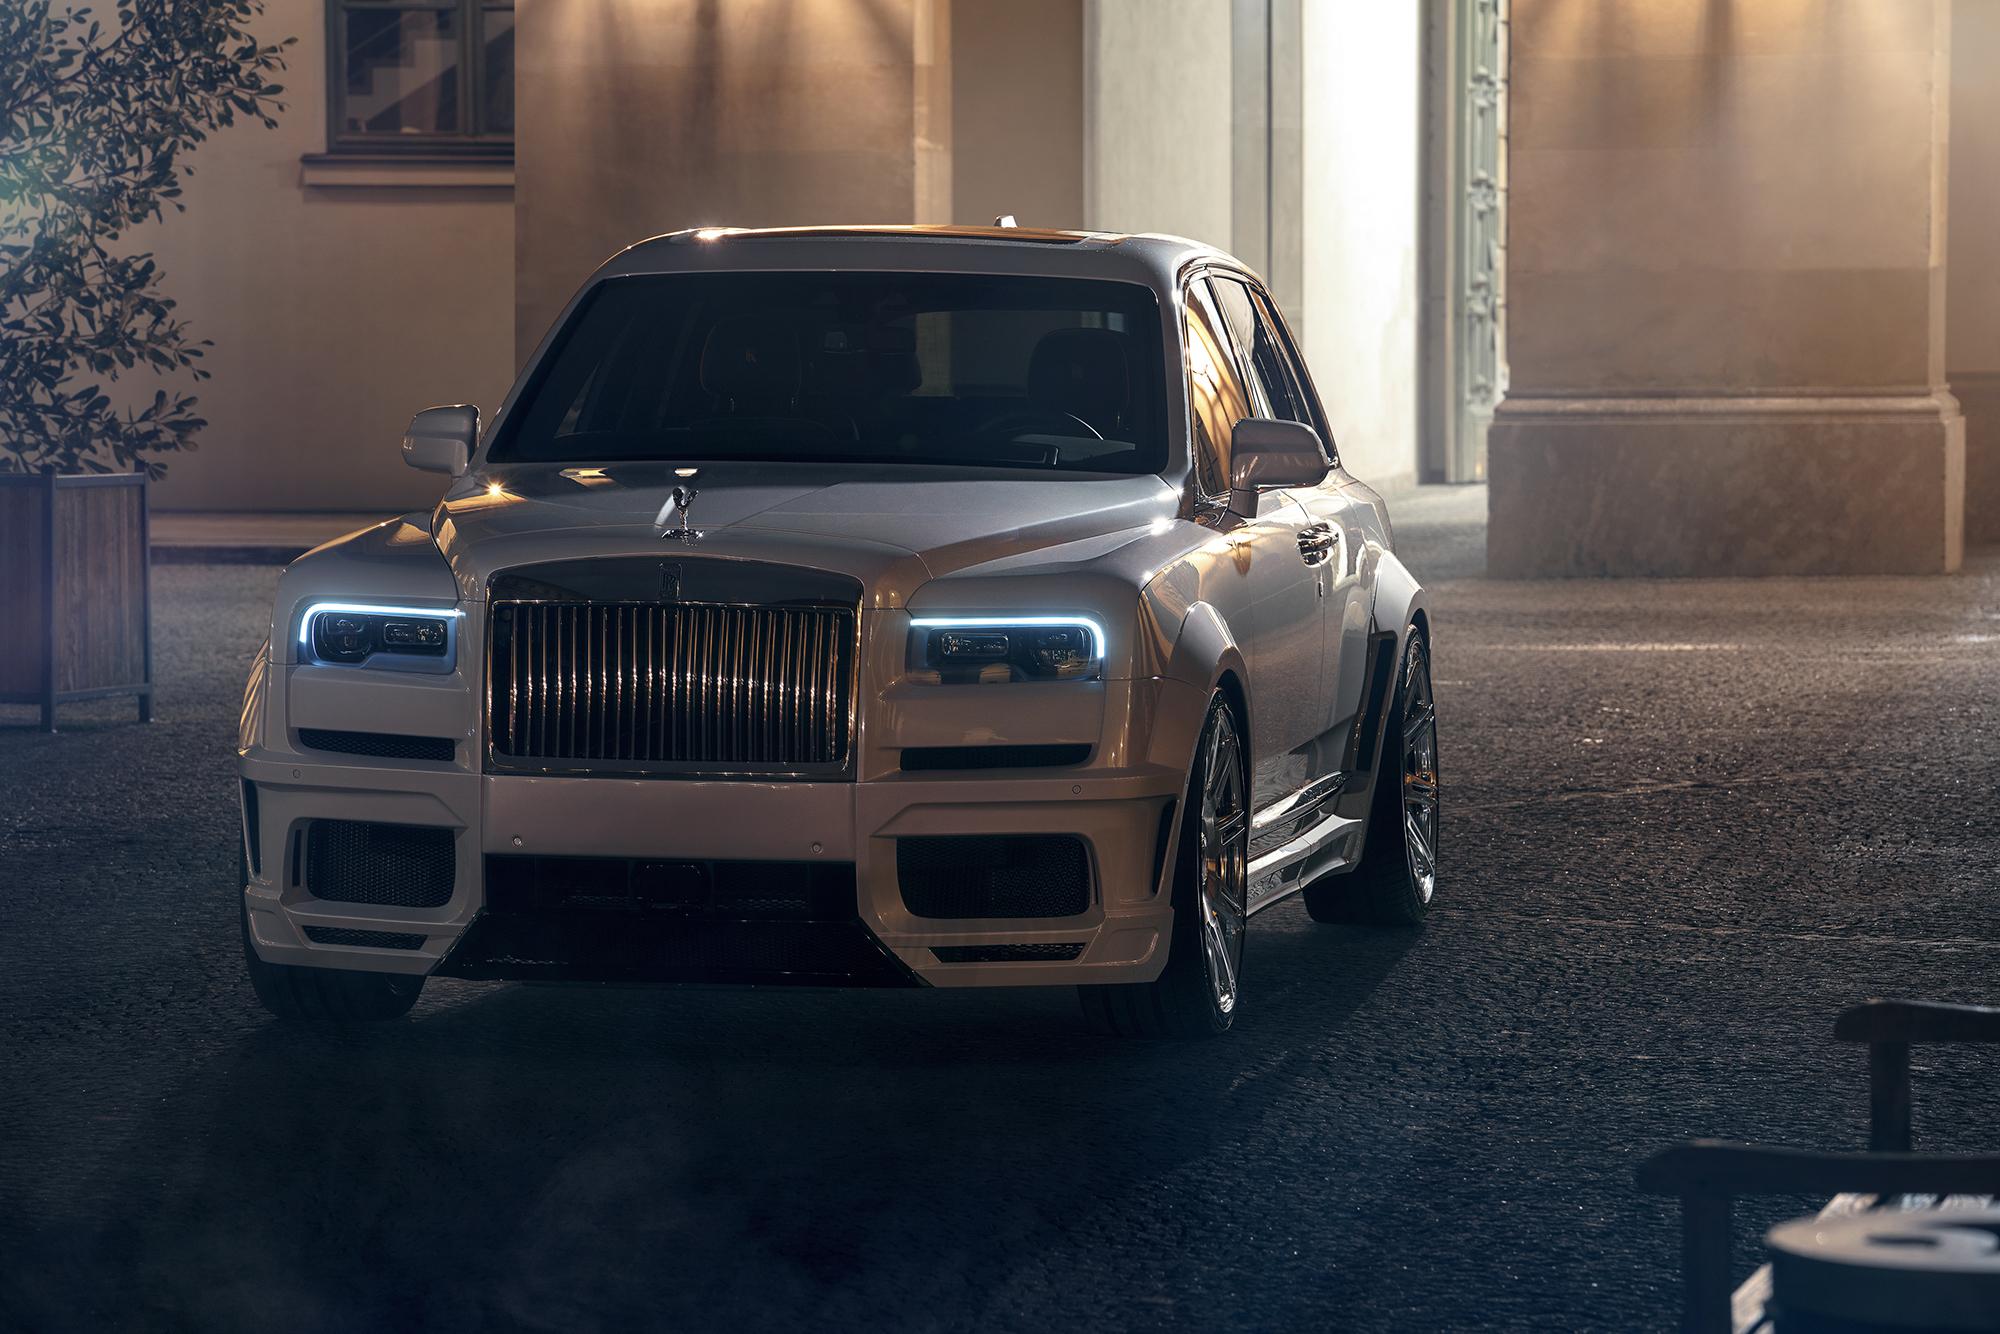 Rolls-Royce Cullinan with Spofec Overdose Body kit